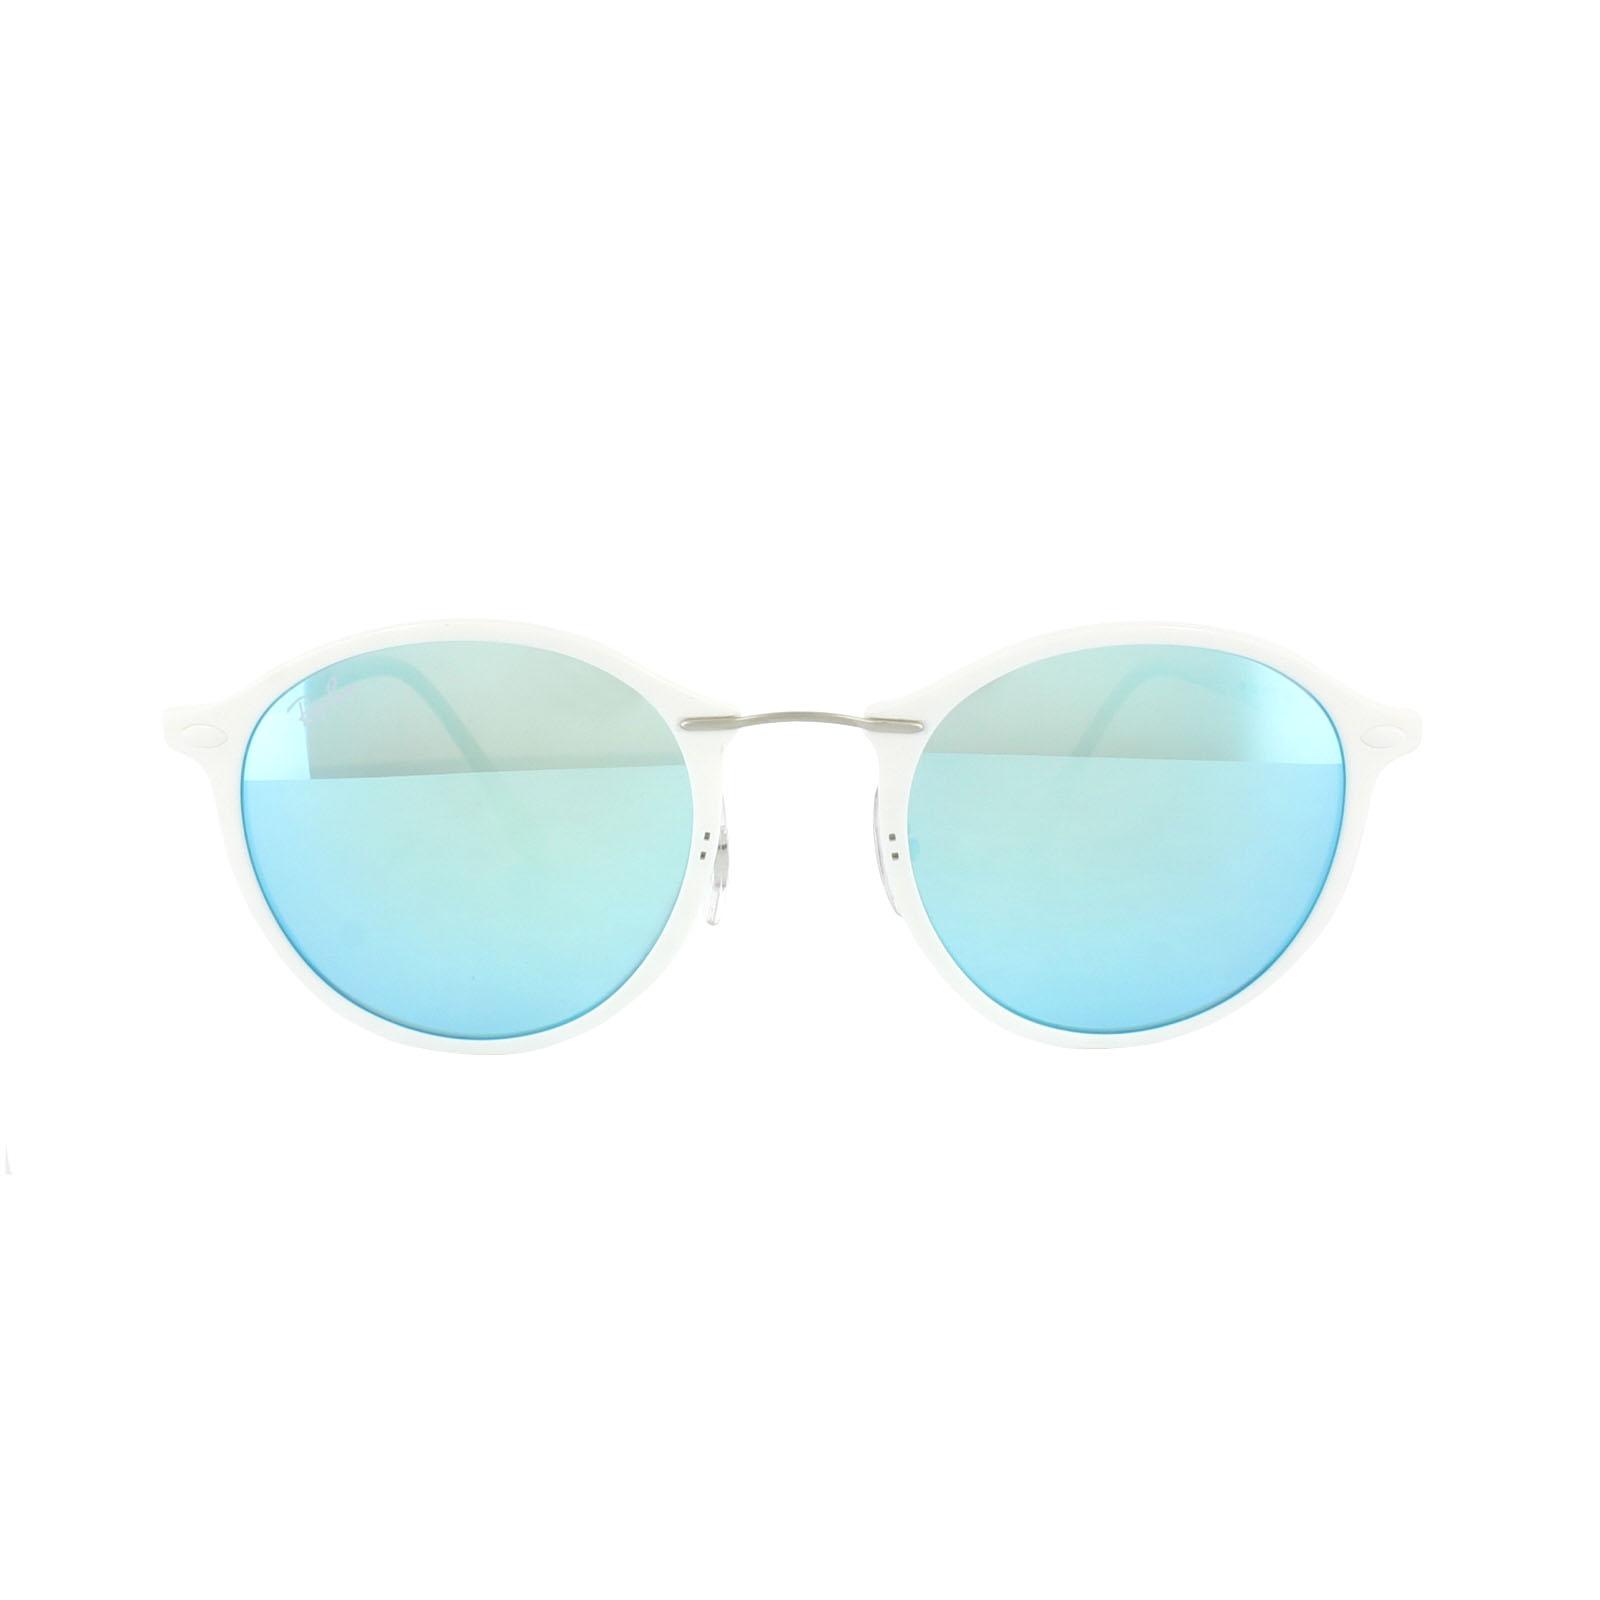 3933c6d393e Ray-Ban Sunglasses 4242 671 55 White Blue Mirror 8053672573527